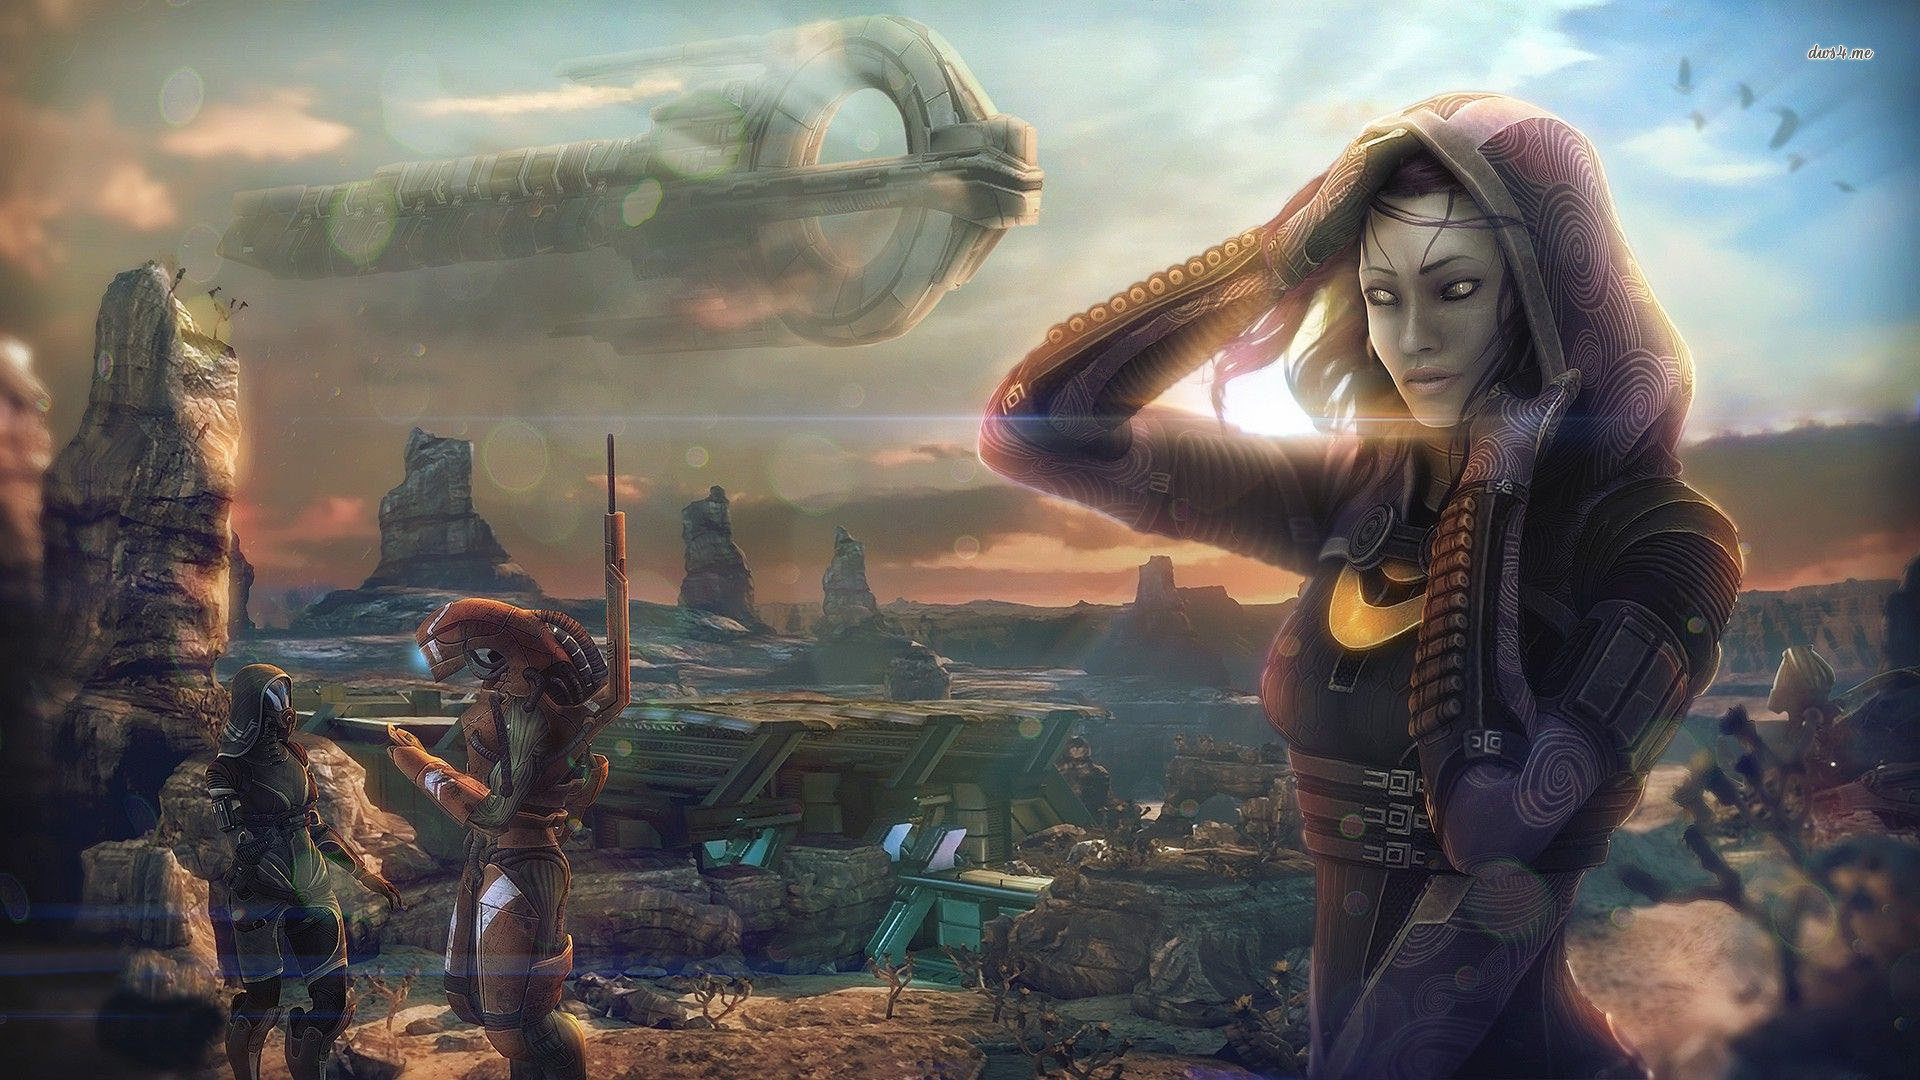 Mass Effect Andromeda 1920x1080: MASS EFFECT 4 Andromeda Sci-fi Shooter Action Futuristic